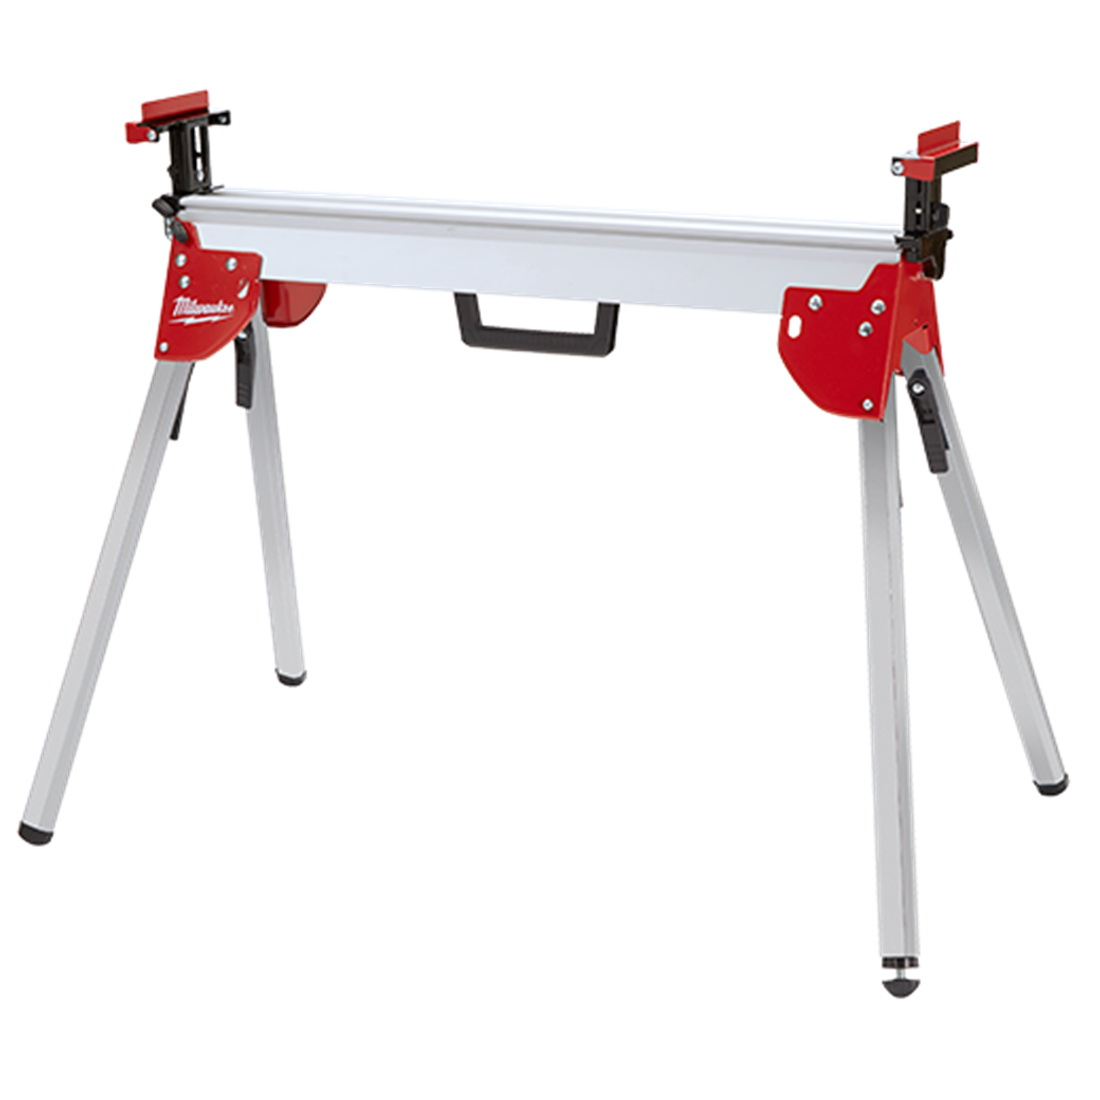 Folding Mitre Saw Stand 1132 x 860mm